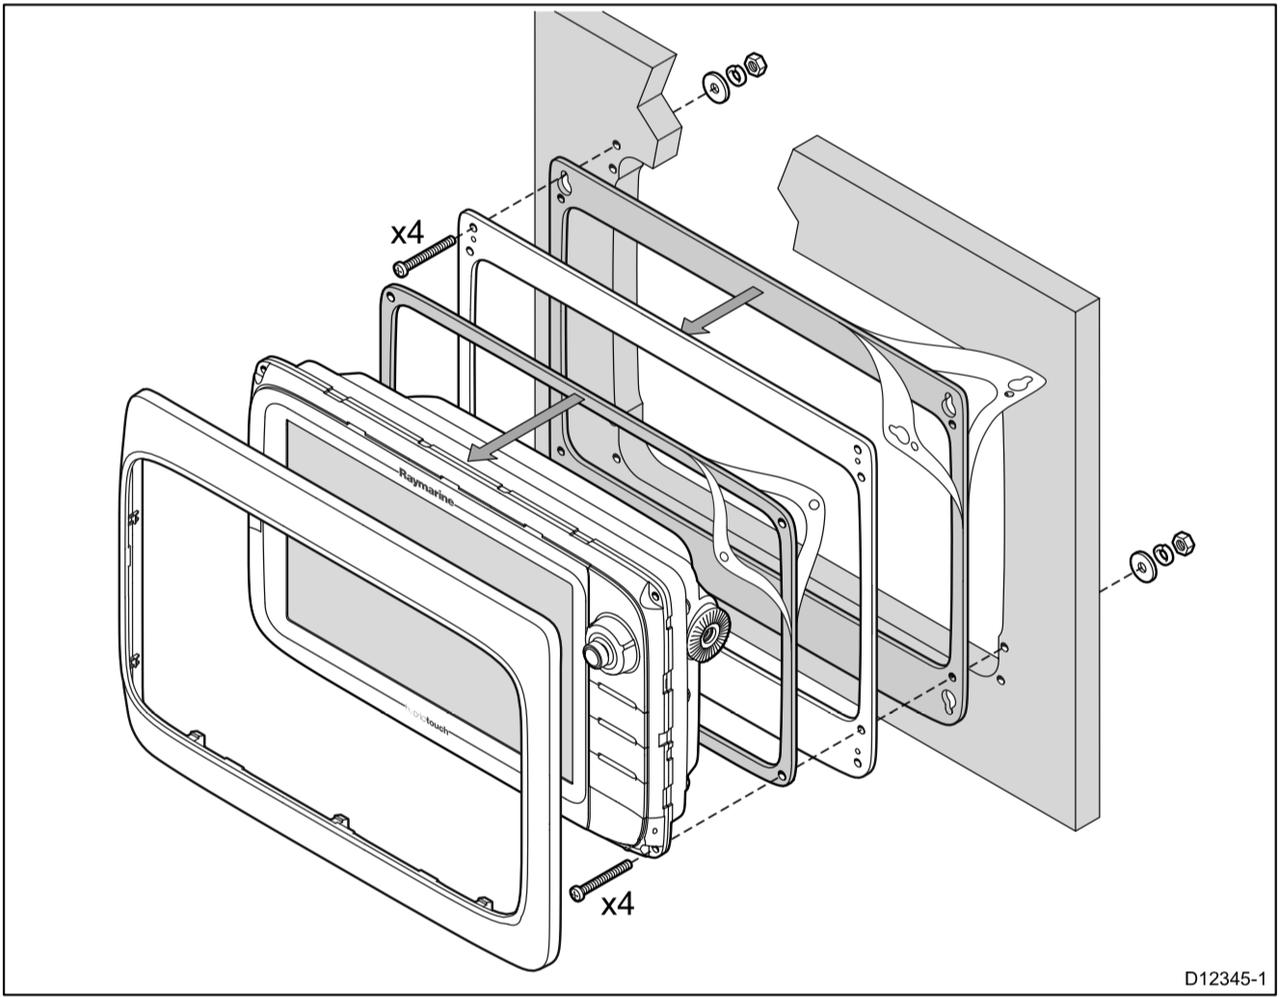 small resolution of 441s garmin wiring diagram wiring diagram h8 q see wiring diagram 441s garmin wiring diagram